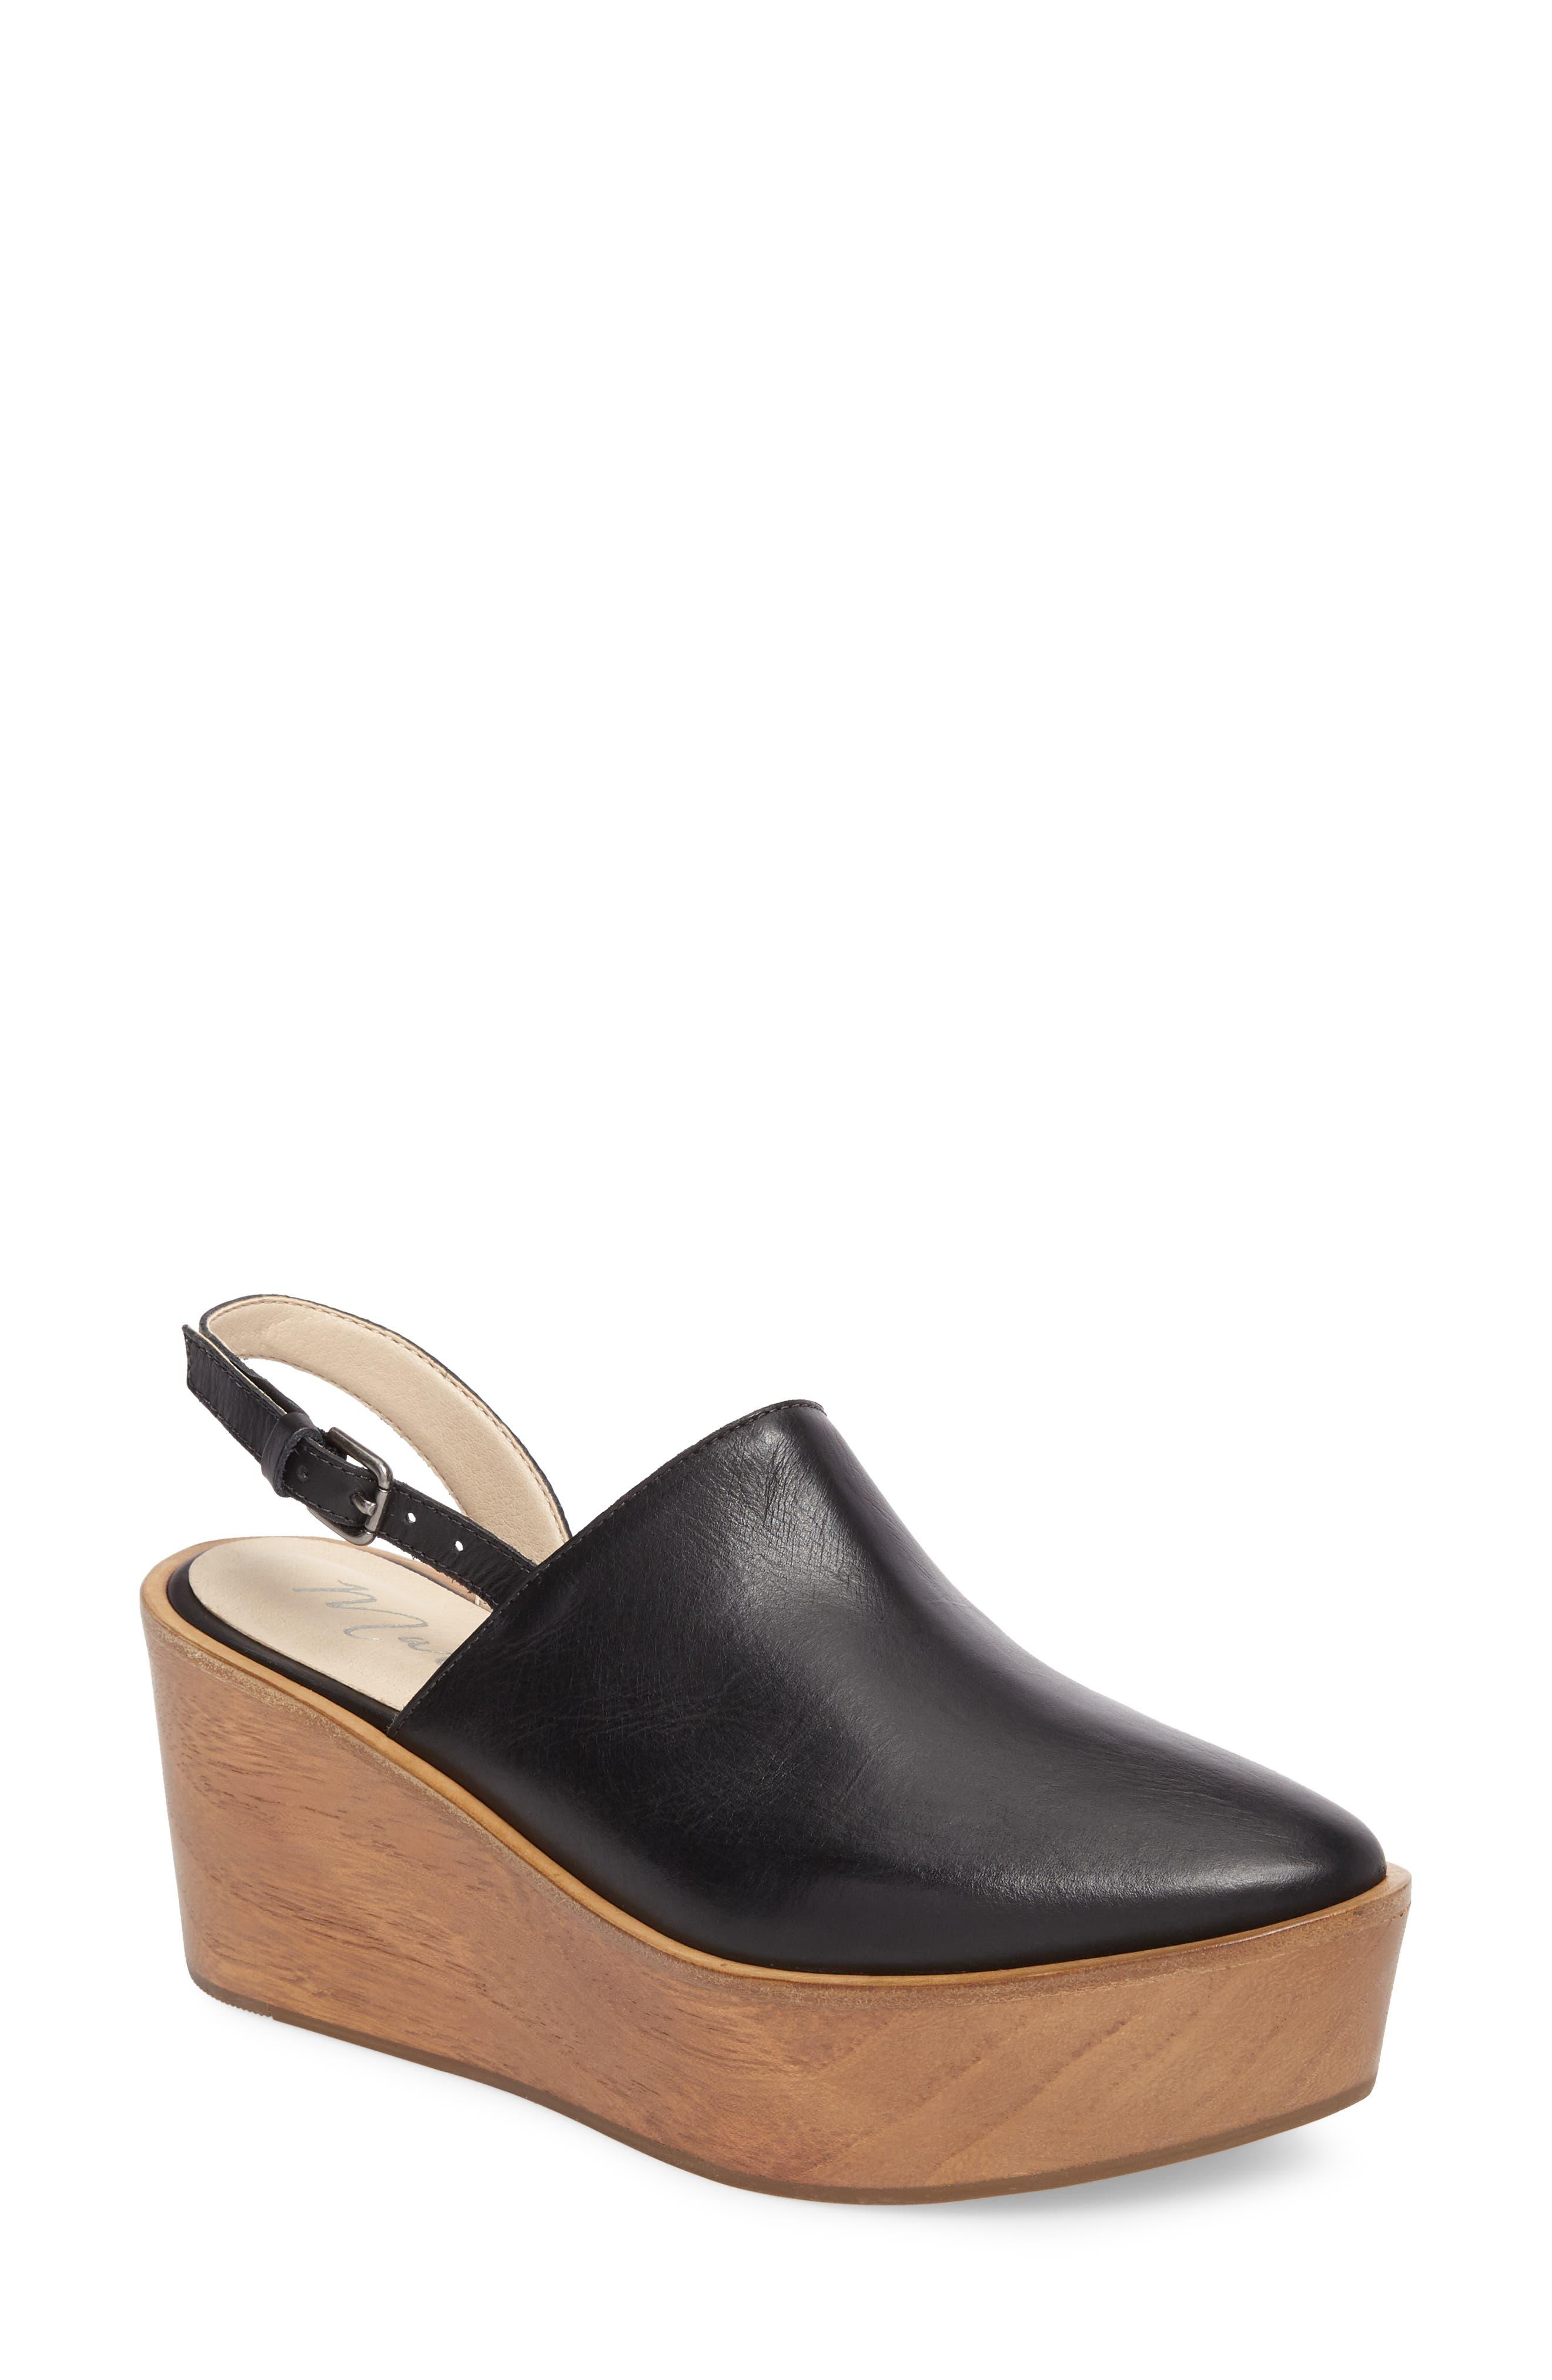 MATISSE,                             Eyals Slingback Platform Wedge Sandal,                             Main thumbnail 1, color,                             001